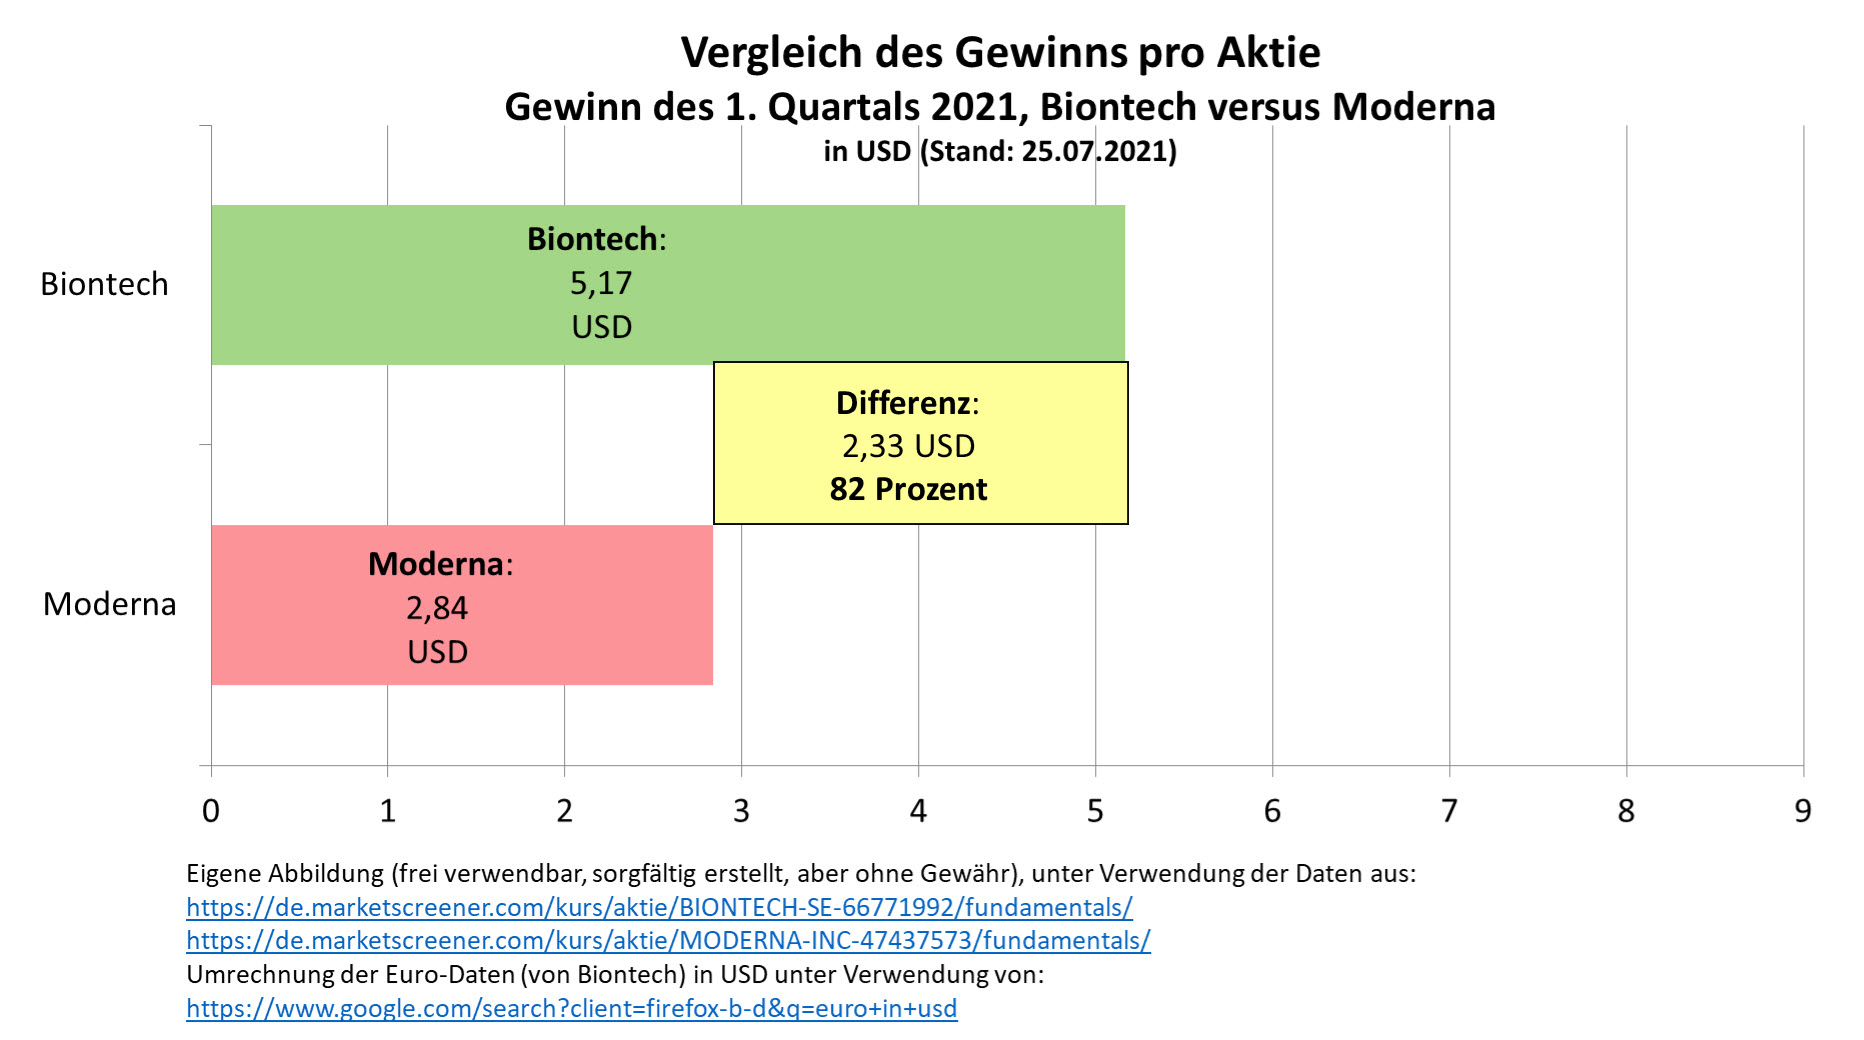 vergleich_gewinn_pro_aktie_q1_biontech_moder....jpg